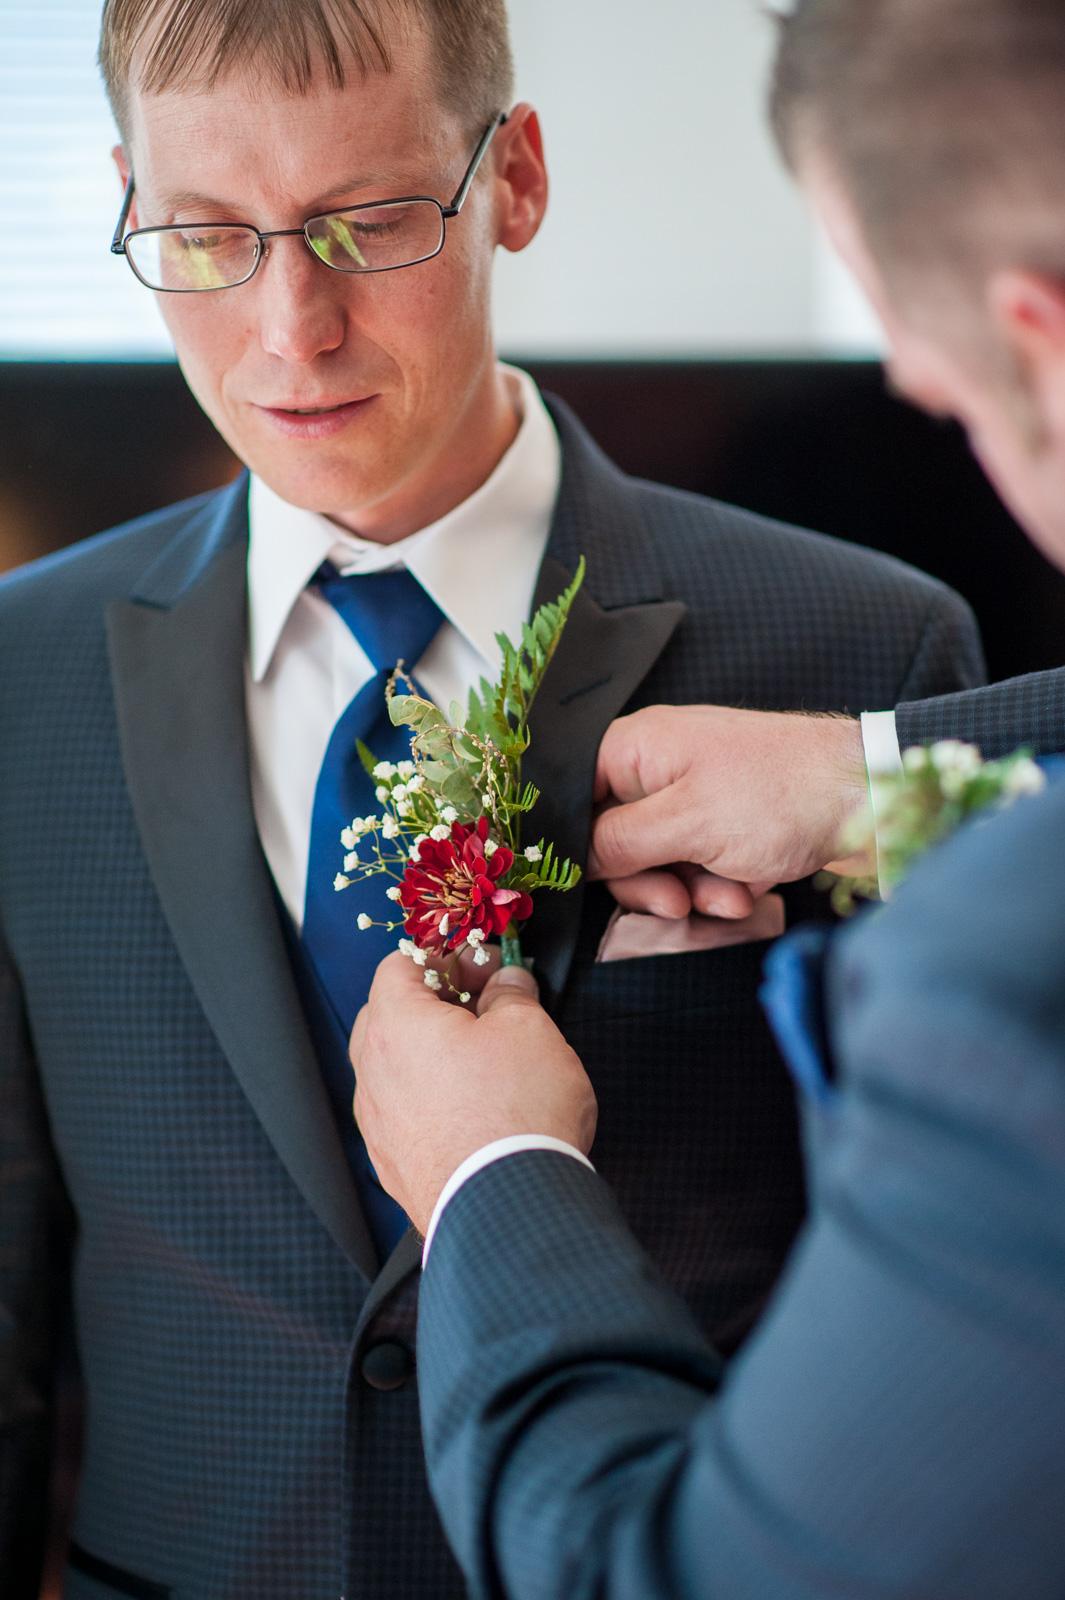 bc-wedding-photographers-paradise-banquet-hall-wedding-12.jpg